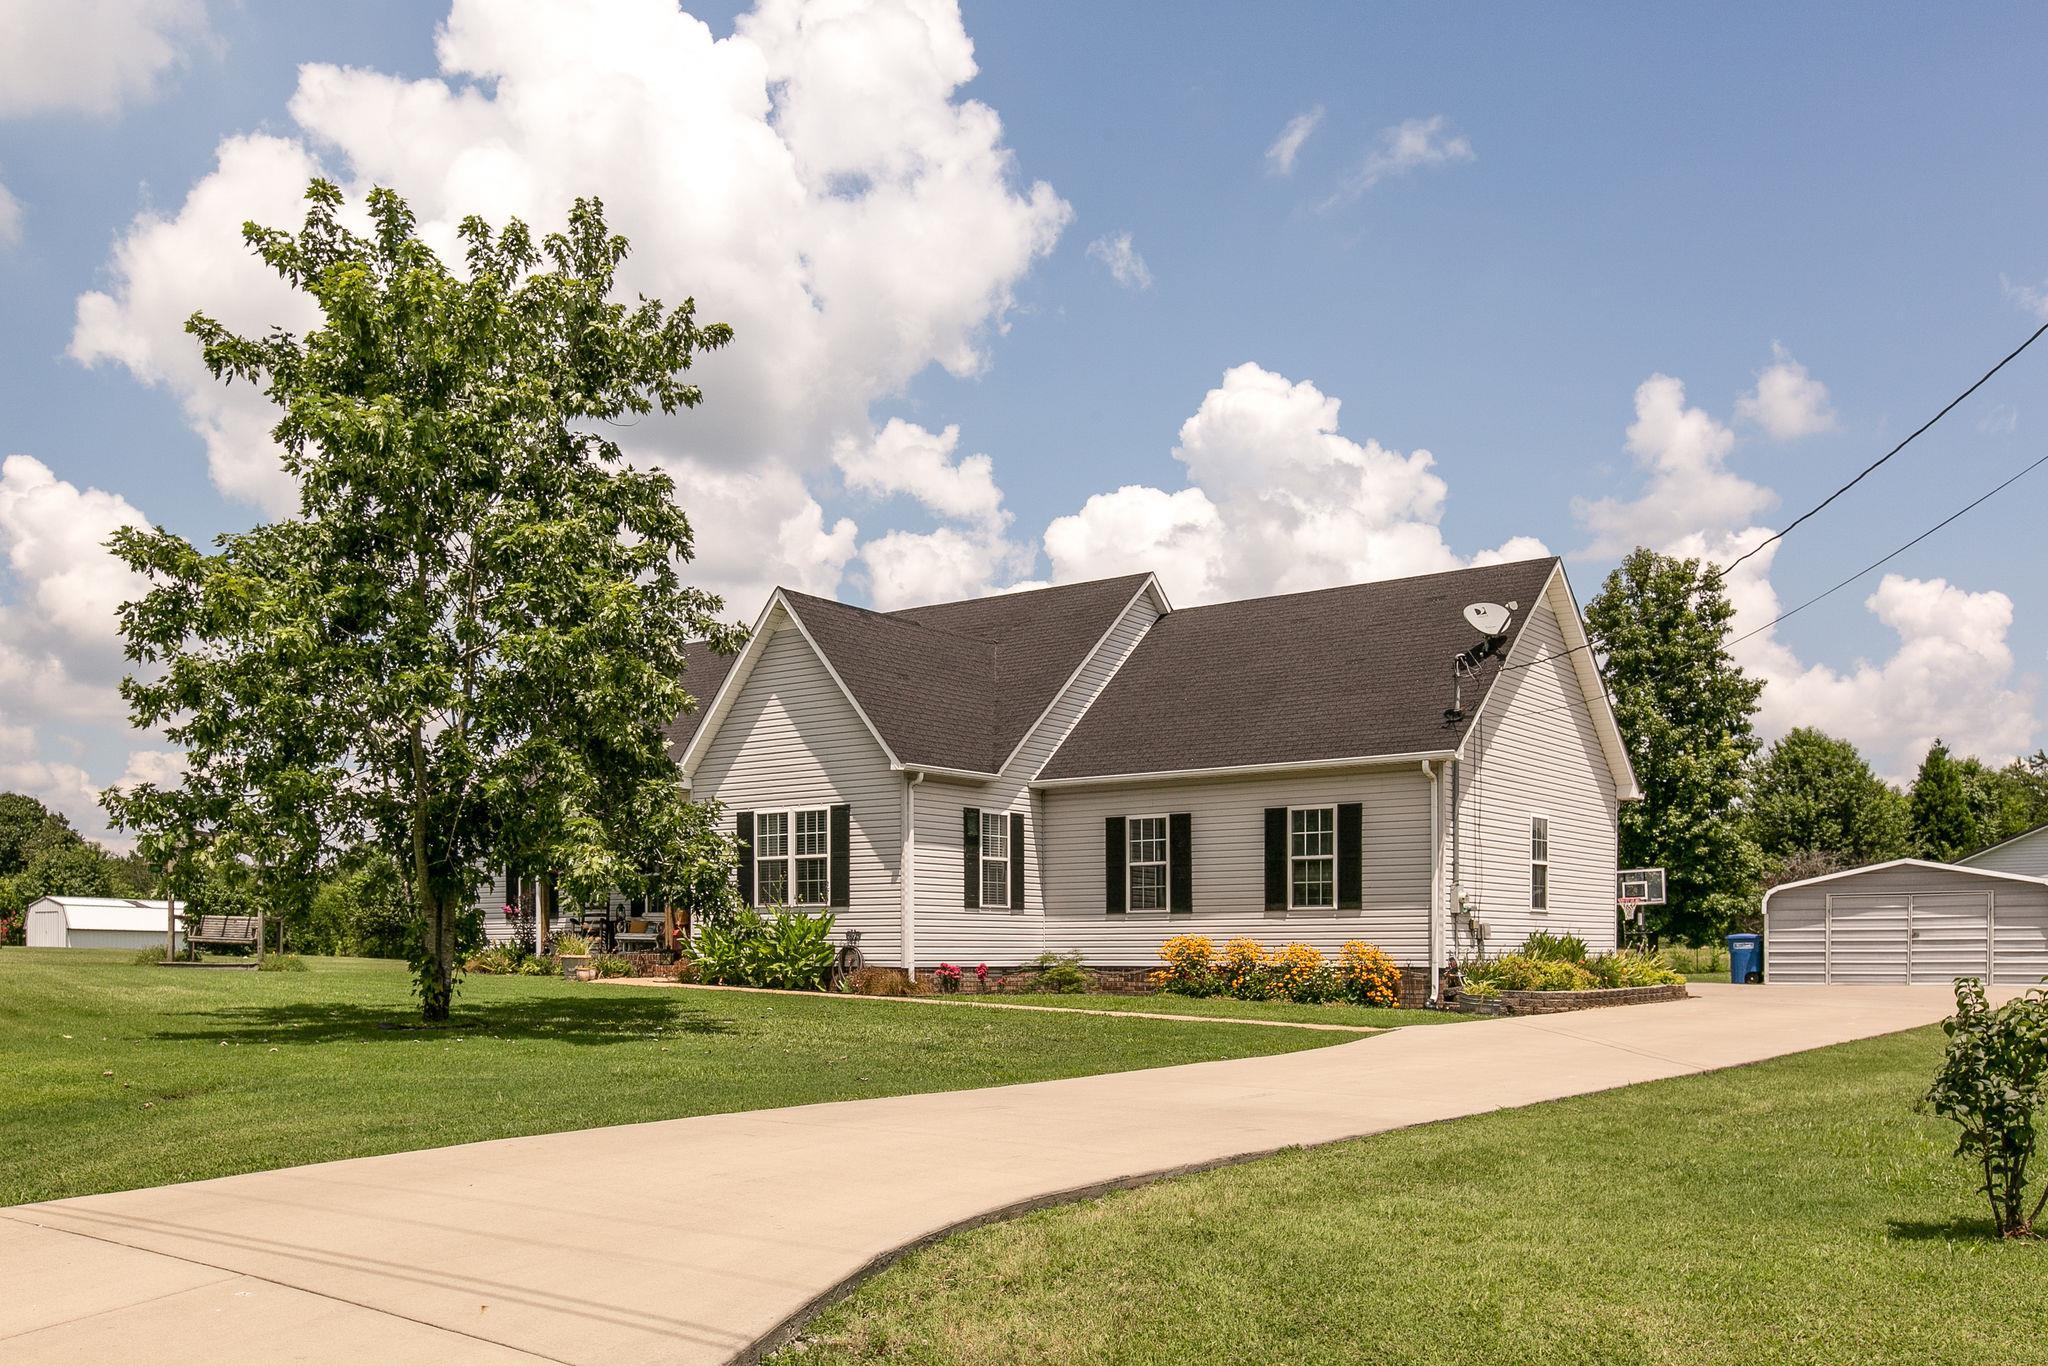 102 Copeland Dr, Mount Pleasant, TN 38474 - Mount Pleasant, TN real estate listing